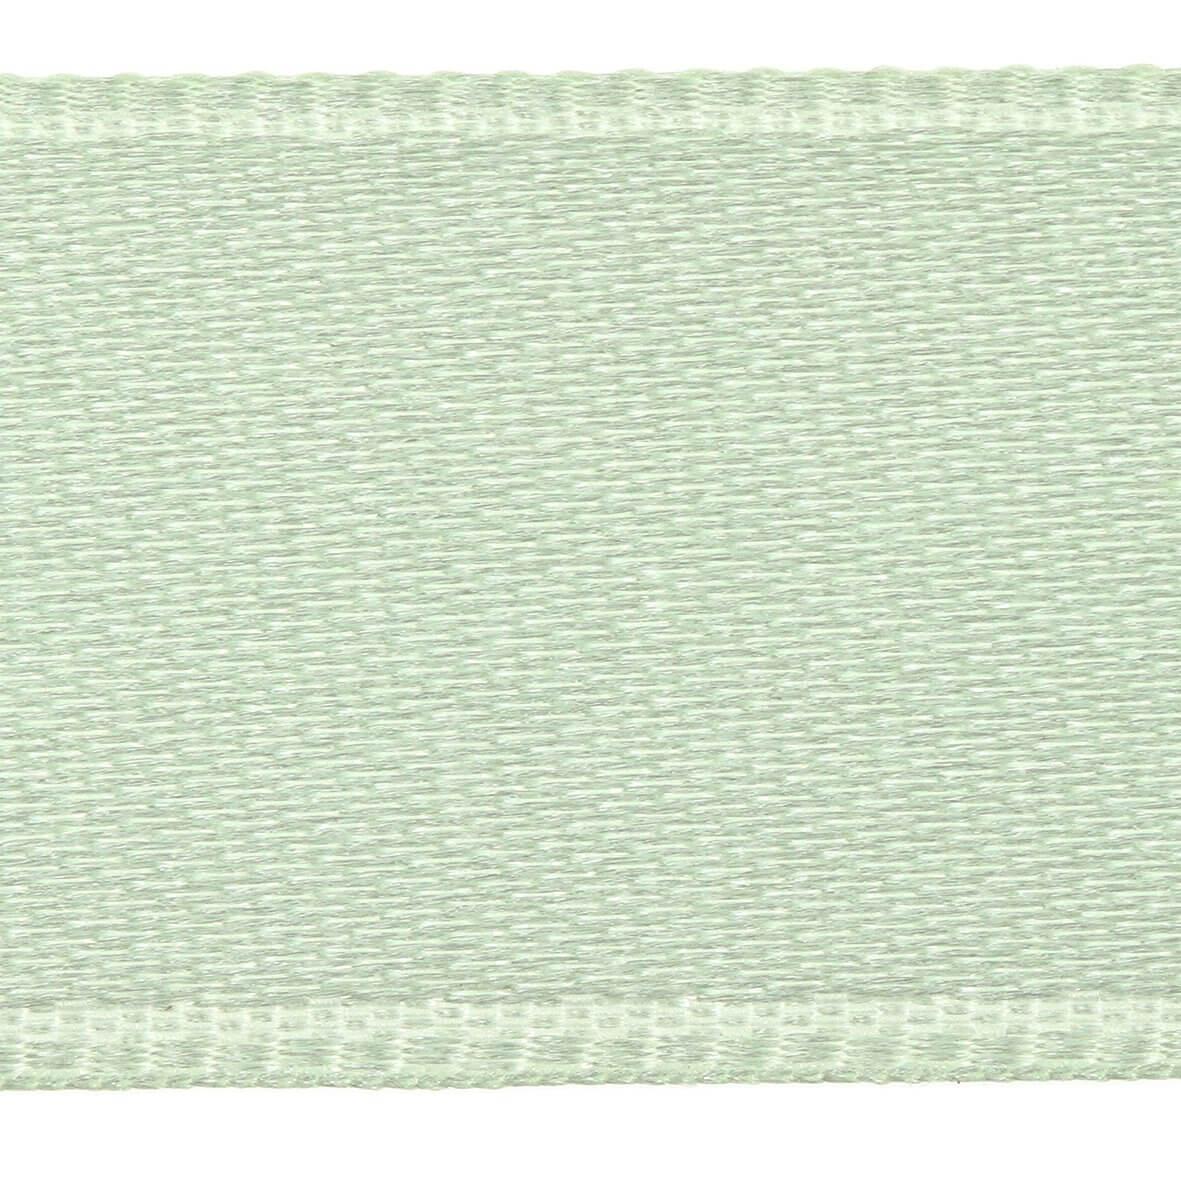 Peppermint Cream Col. 227 - 25mm Satab Ribbon